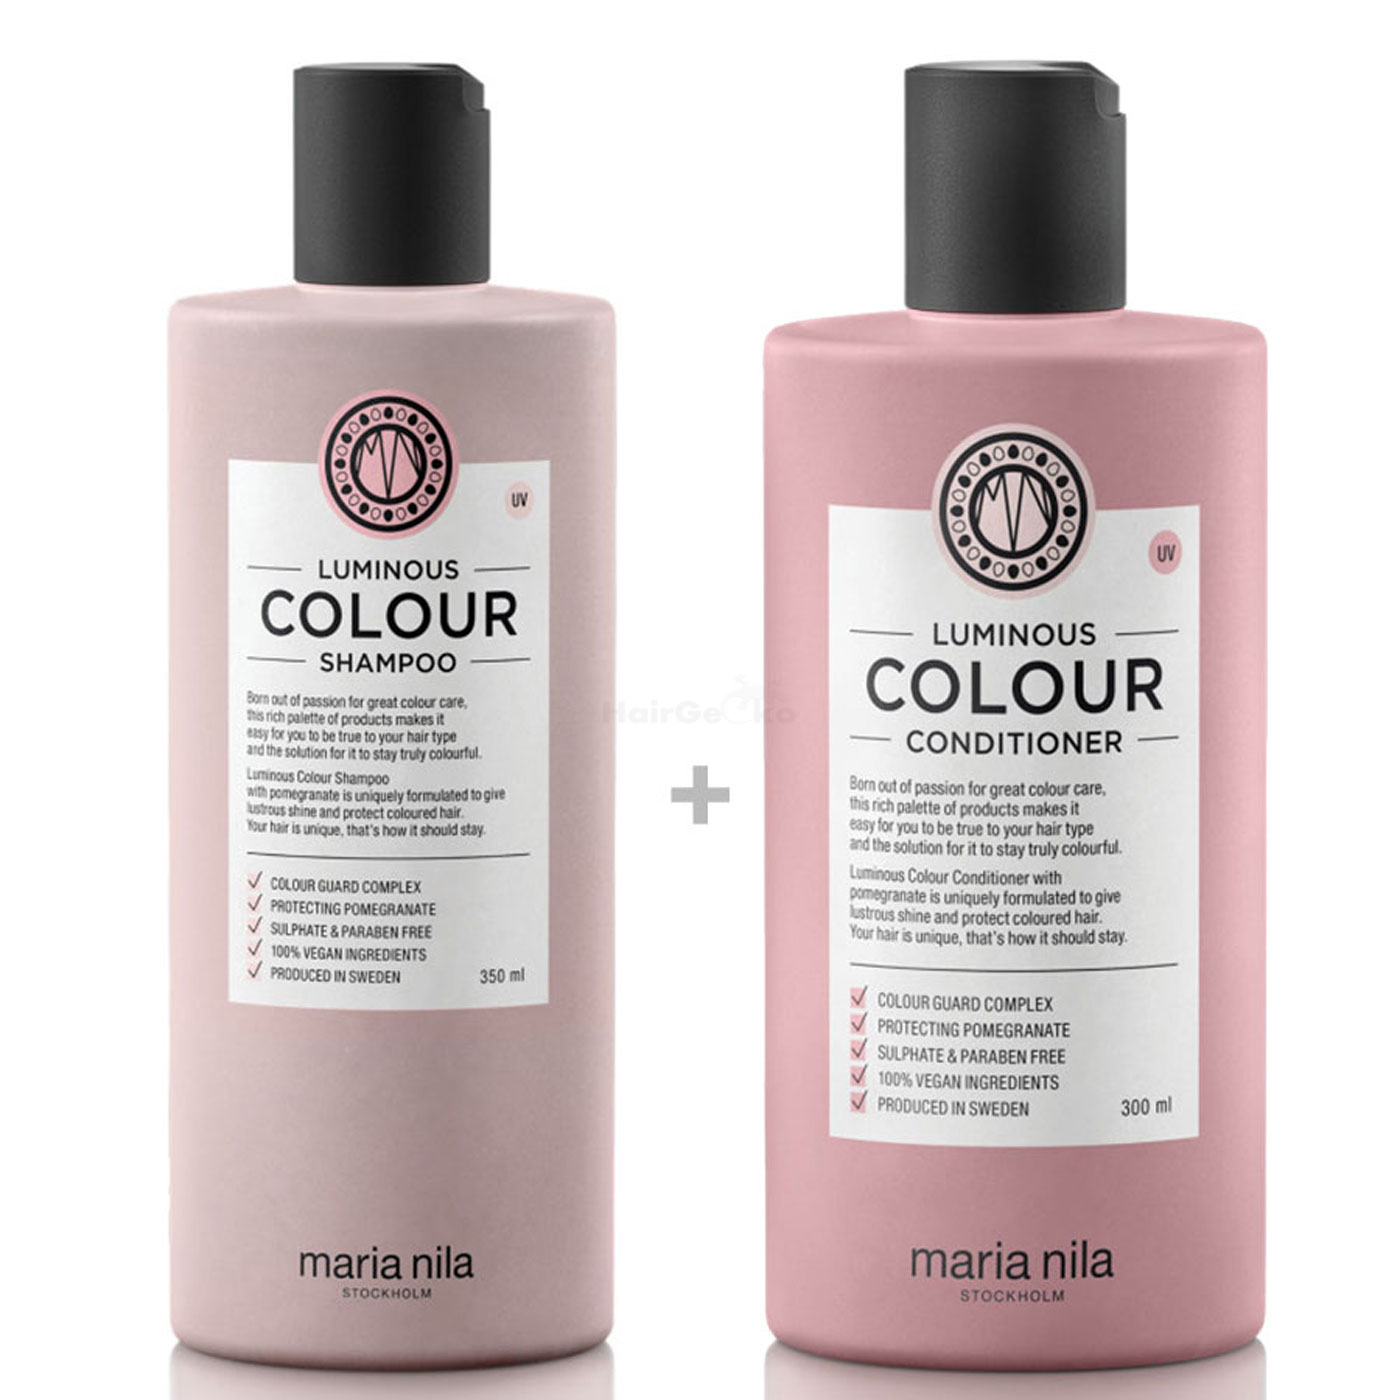 Maria Nila Luminous Colour Set - Shampoo 350 ml + Conditioner 300 ml